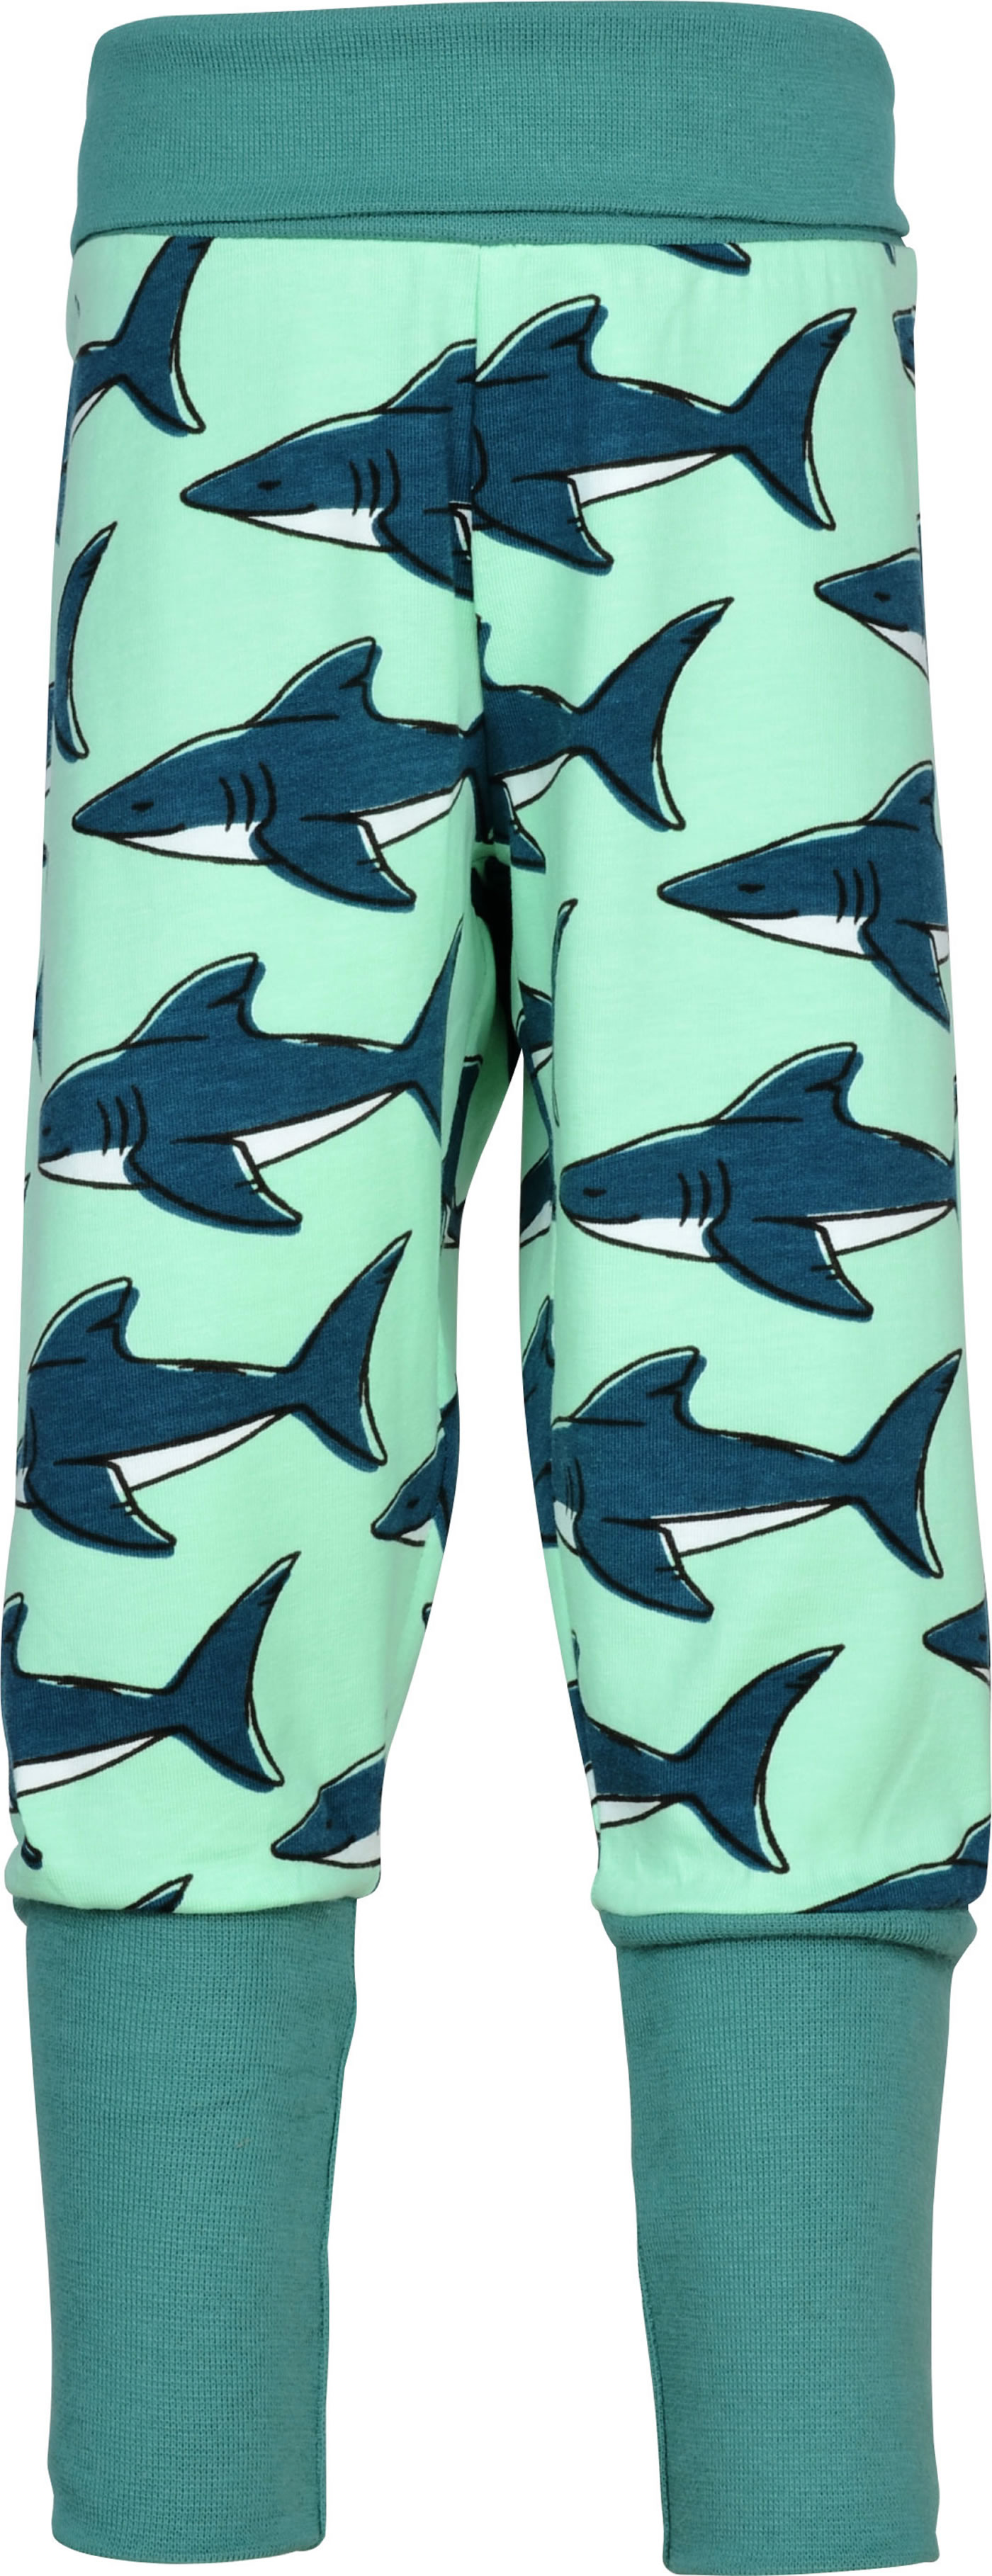 Maxomorra Baby Rib Pants Shark